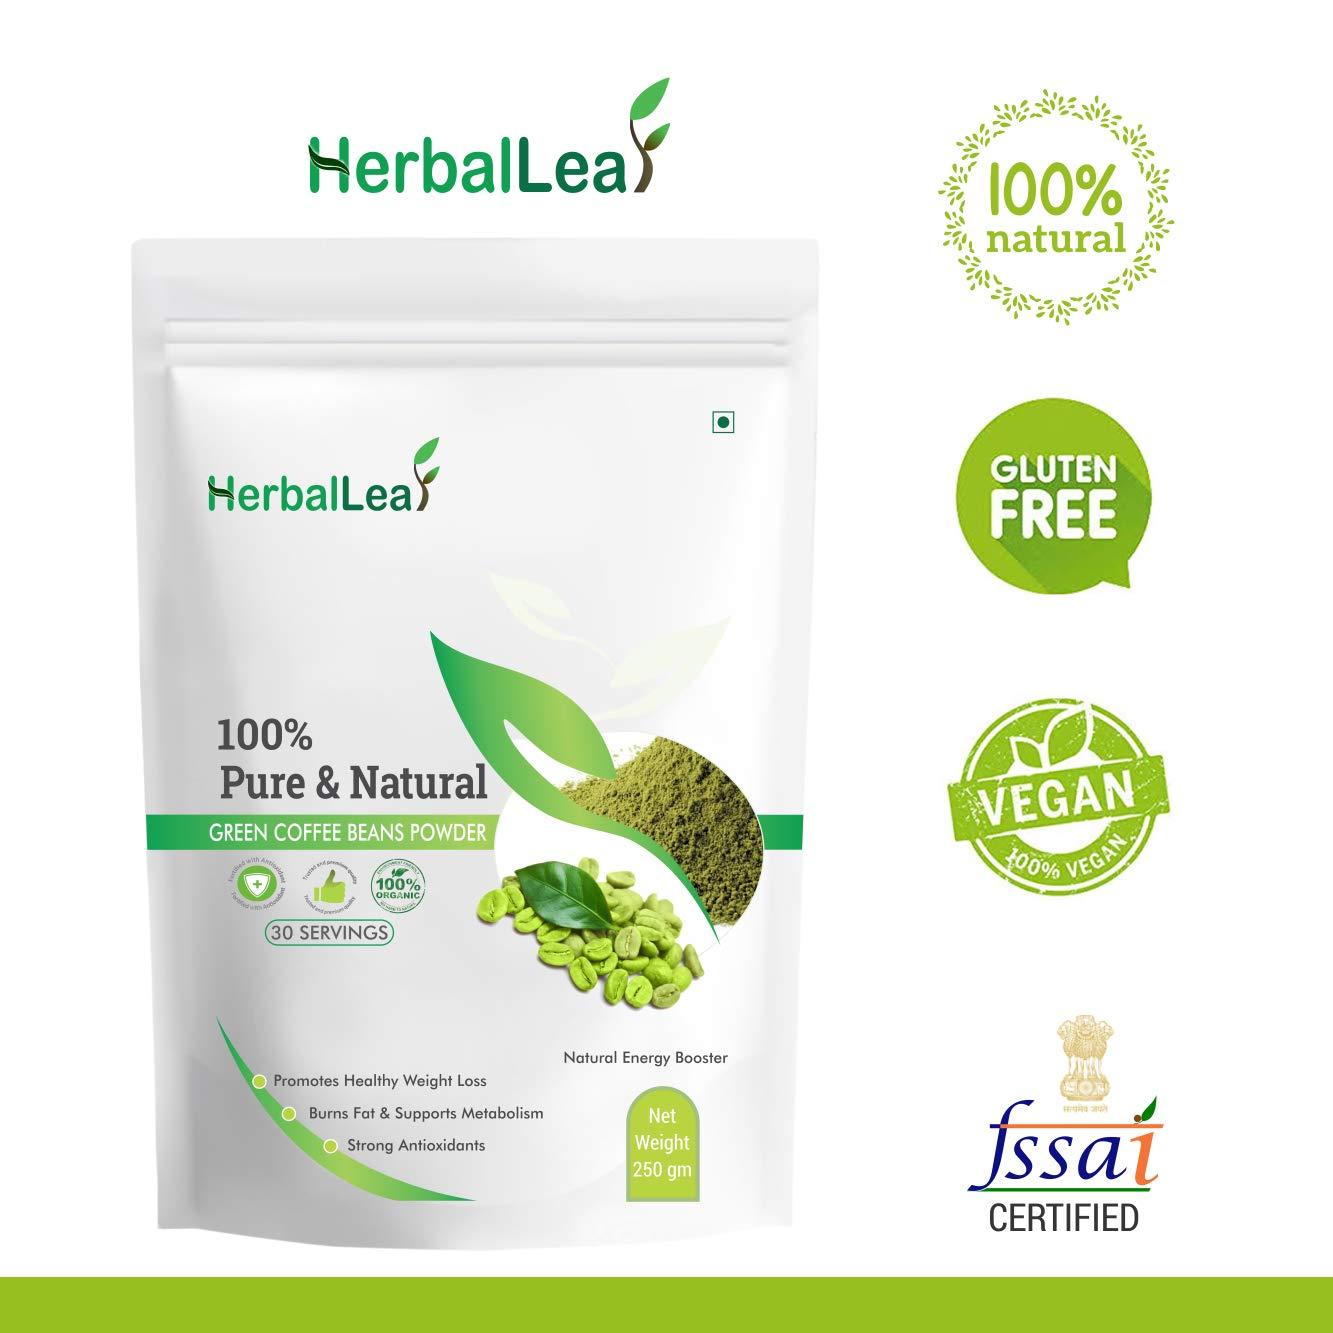 Buy HerbalLeaf Pure & Natural Green Coffee Beans Powder | Pack of 1